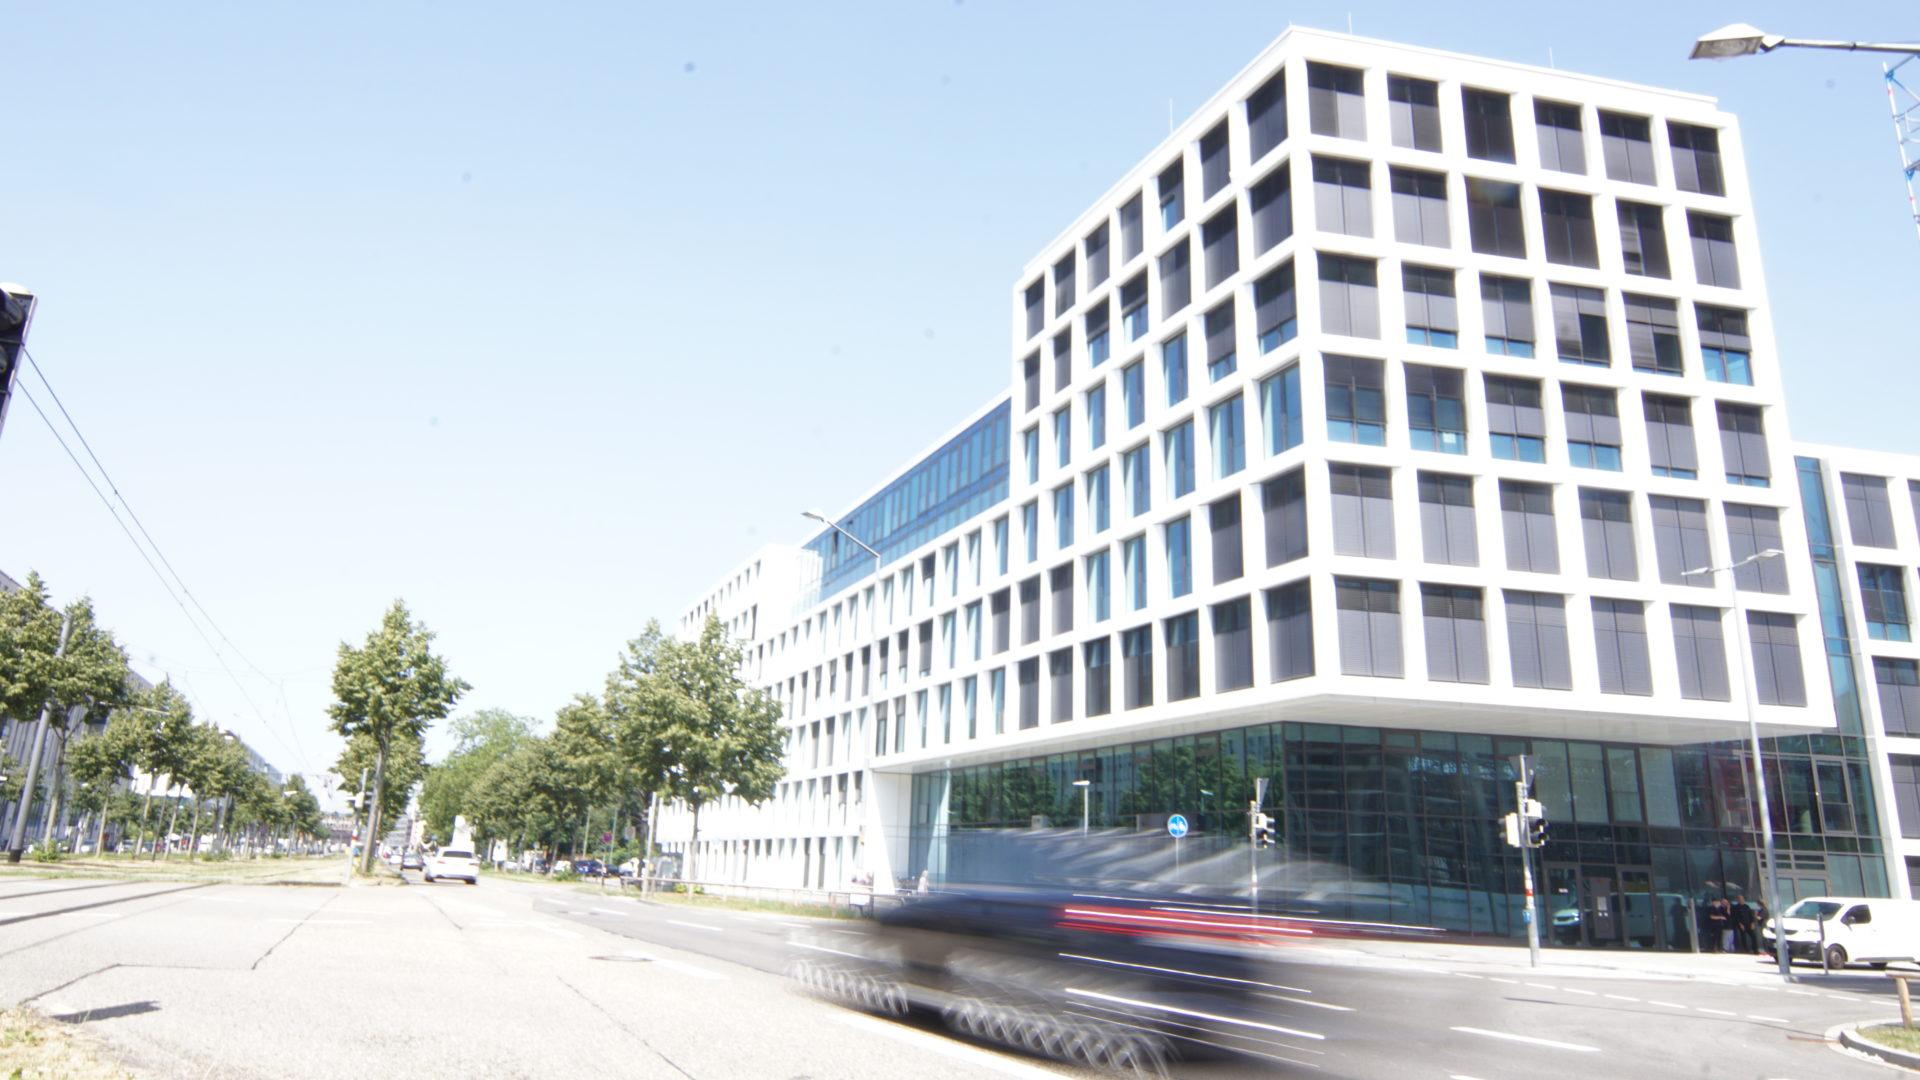 Büroflächen Ludwig-Erhard-Allee, Karlsruhe